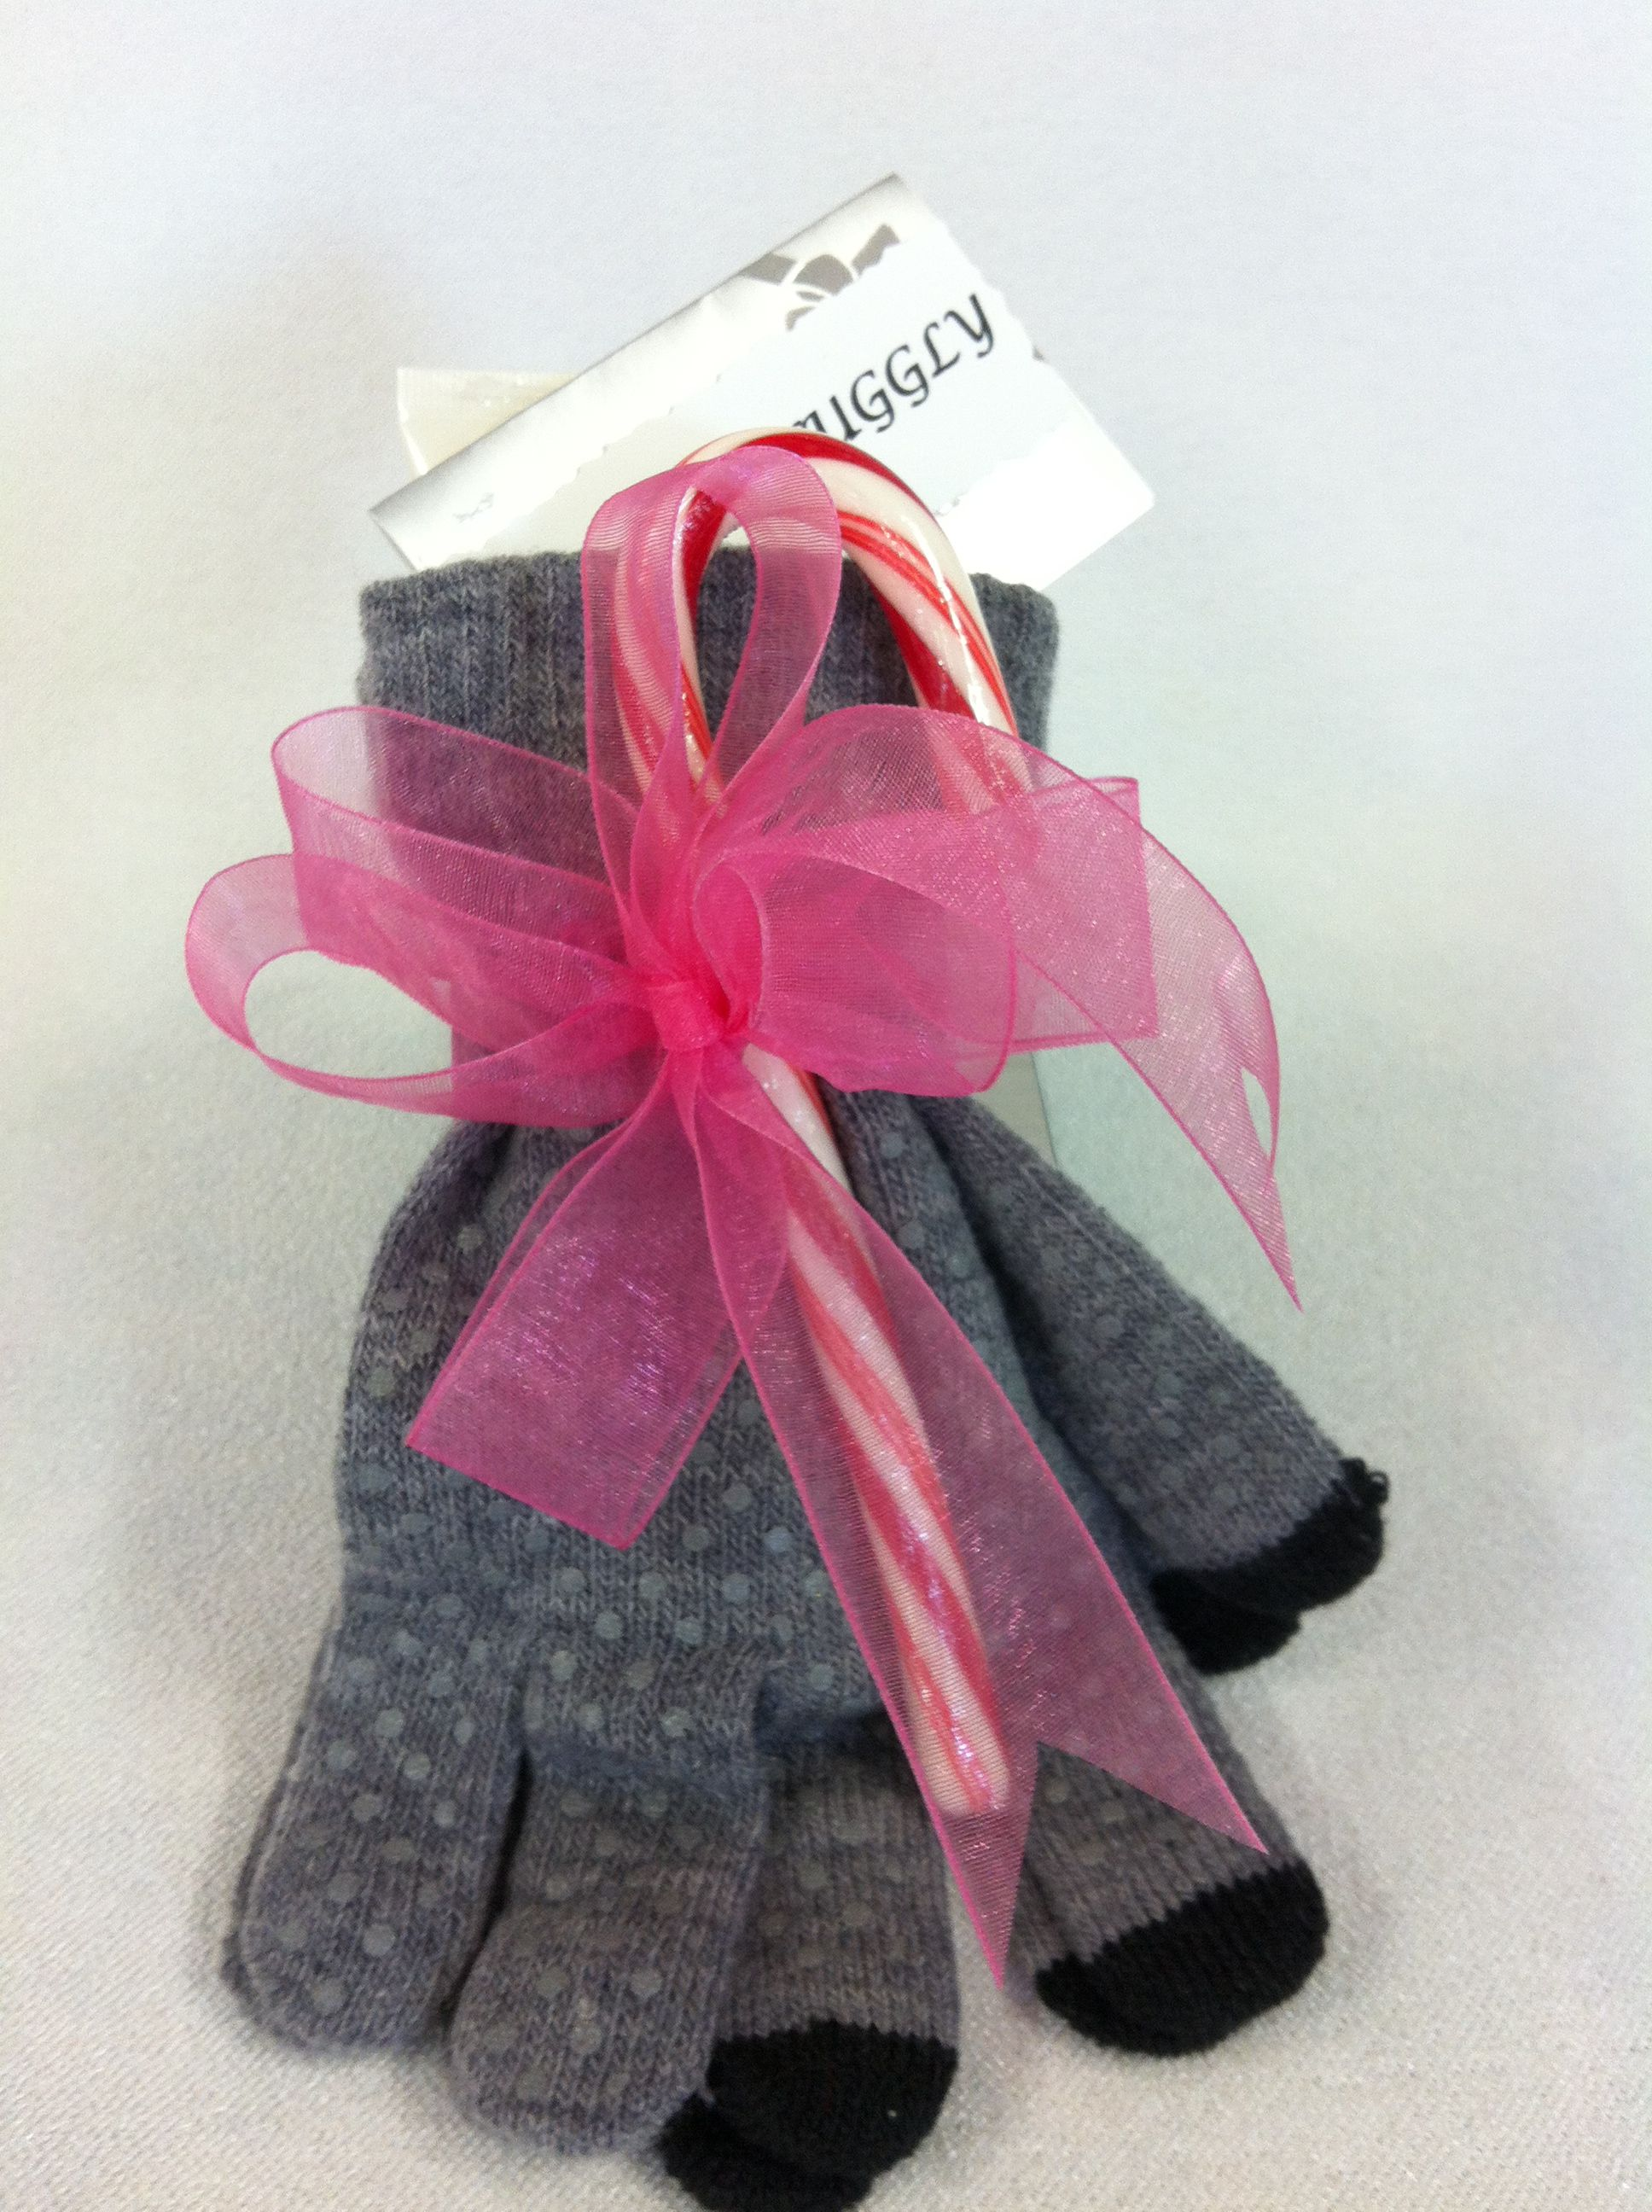 Kis Mary Kay Gas Gloves Cute Poem Hand Cream And Mini